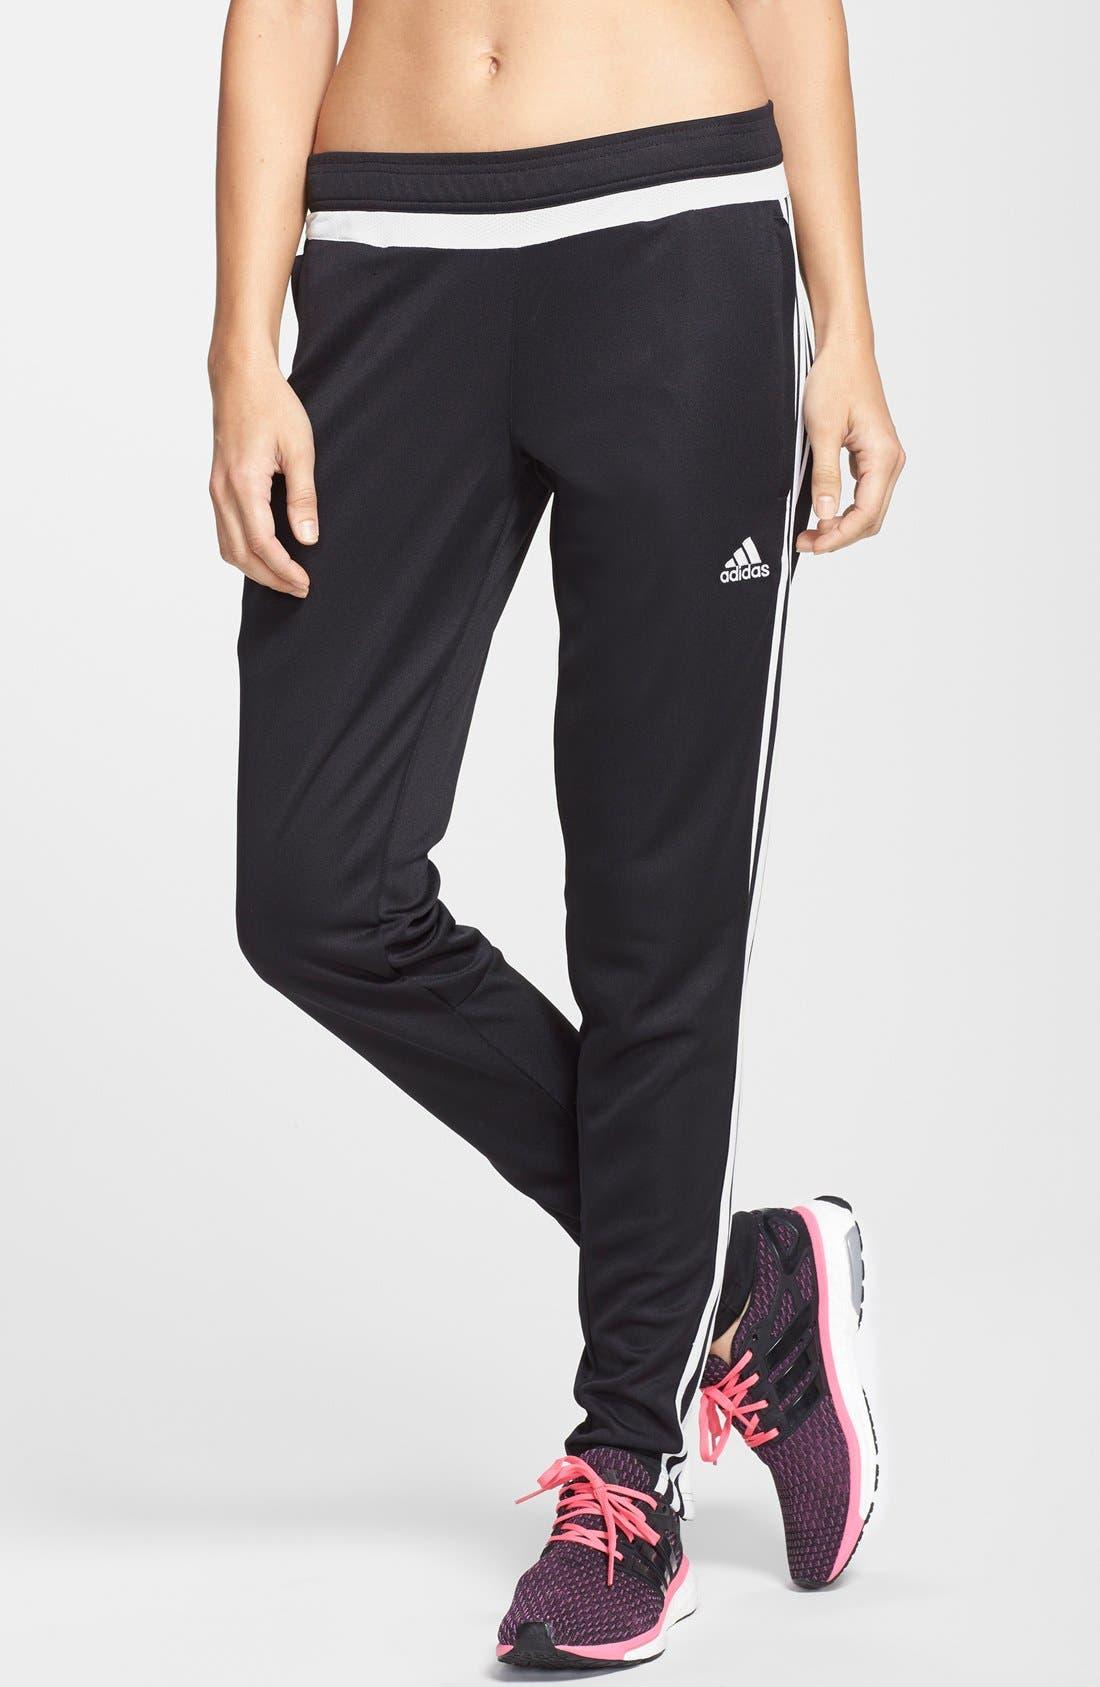 Alternate Image 1 Selected - adidas 'Tiro 15' Training Pants